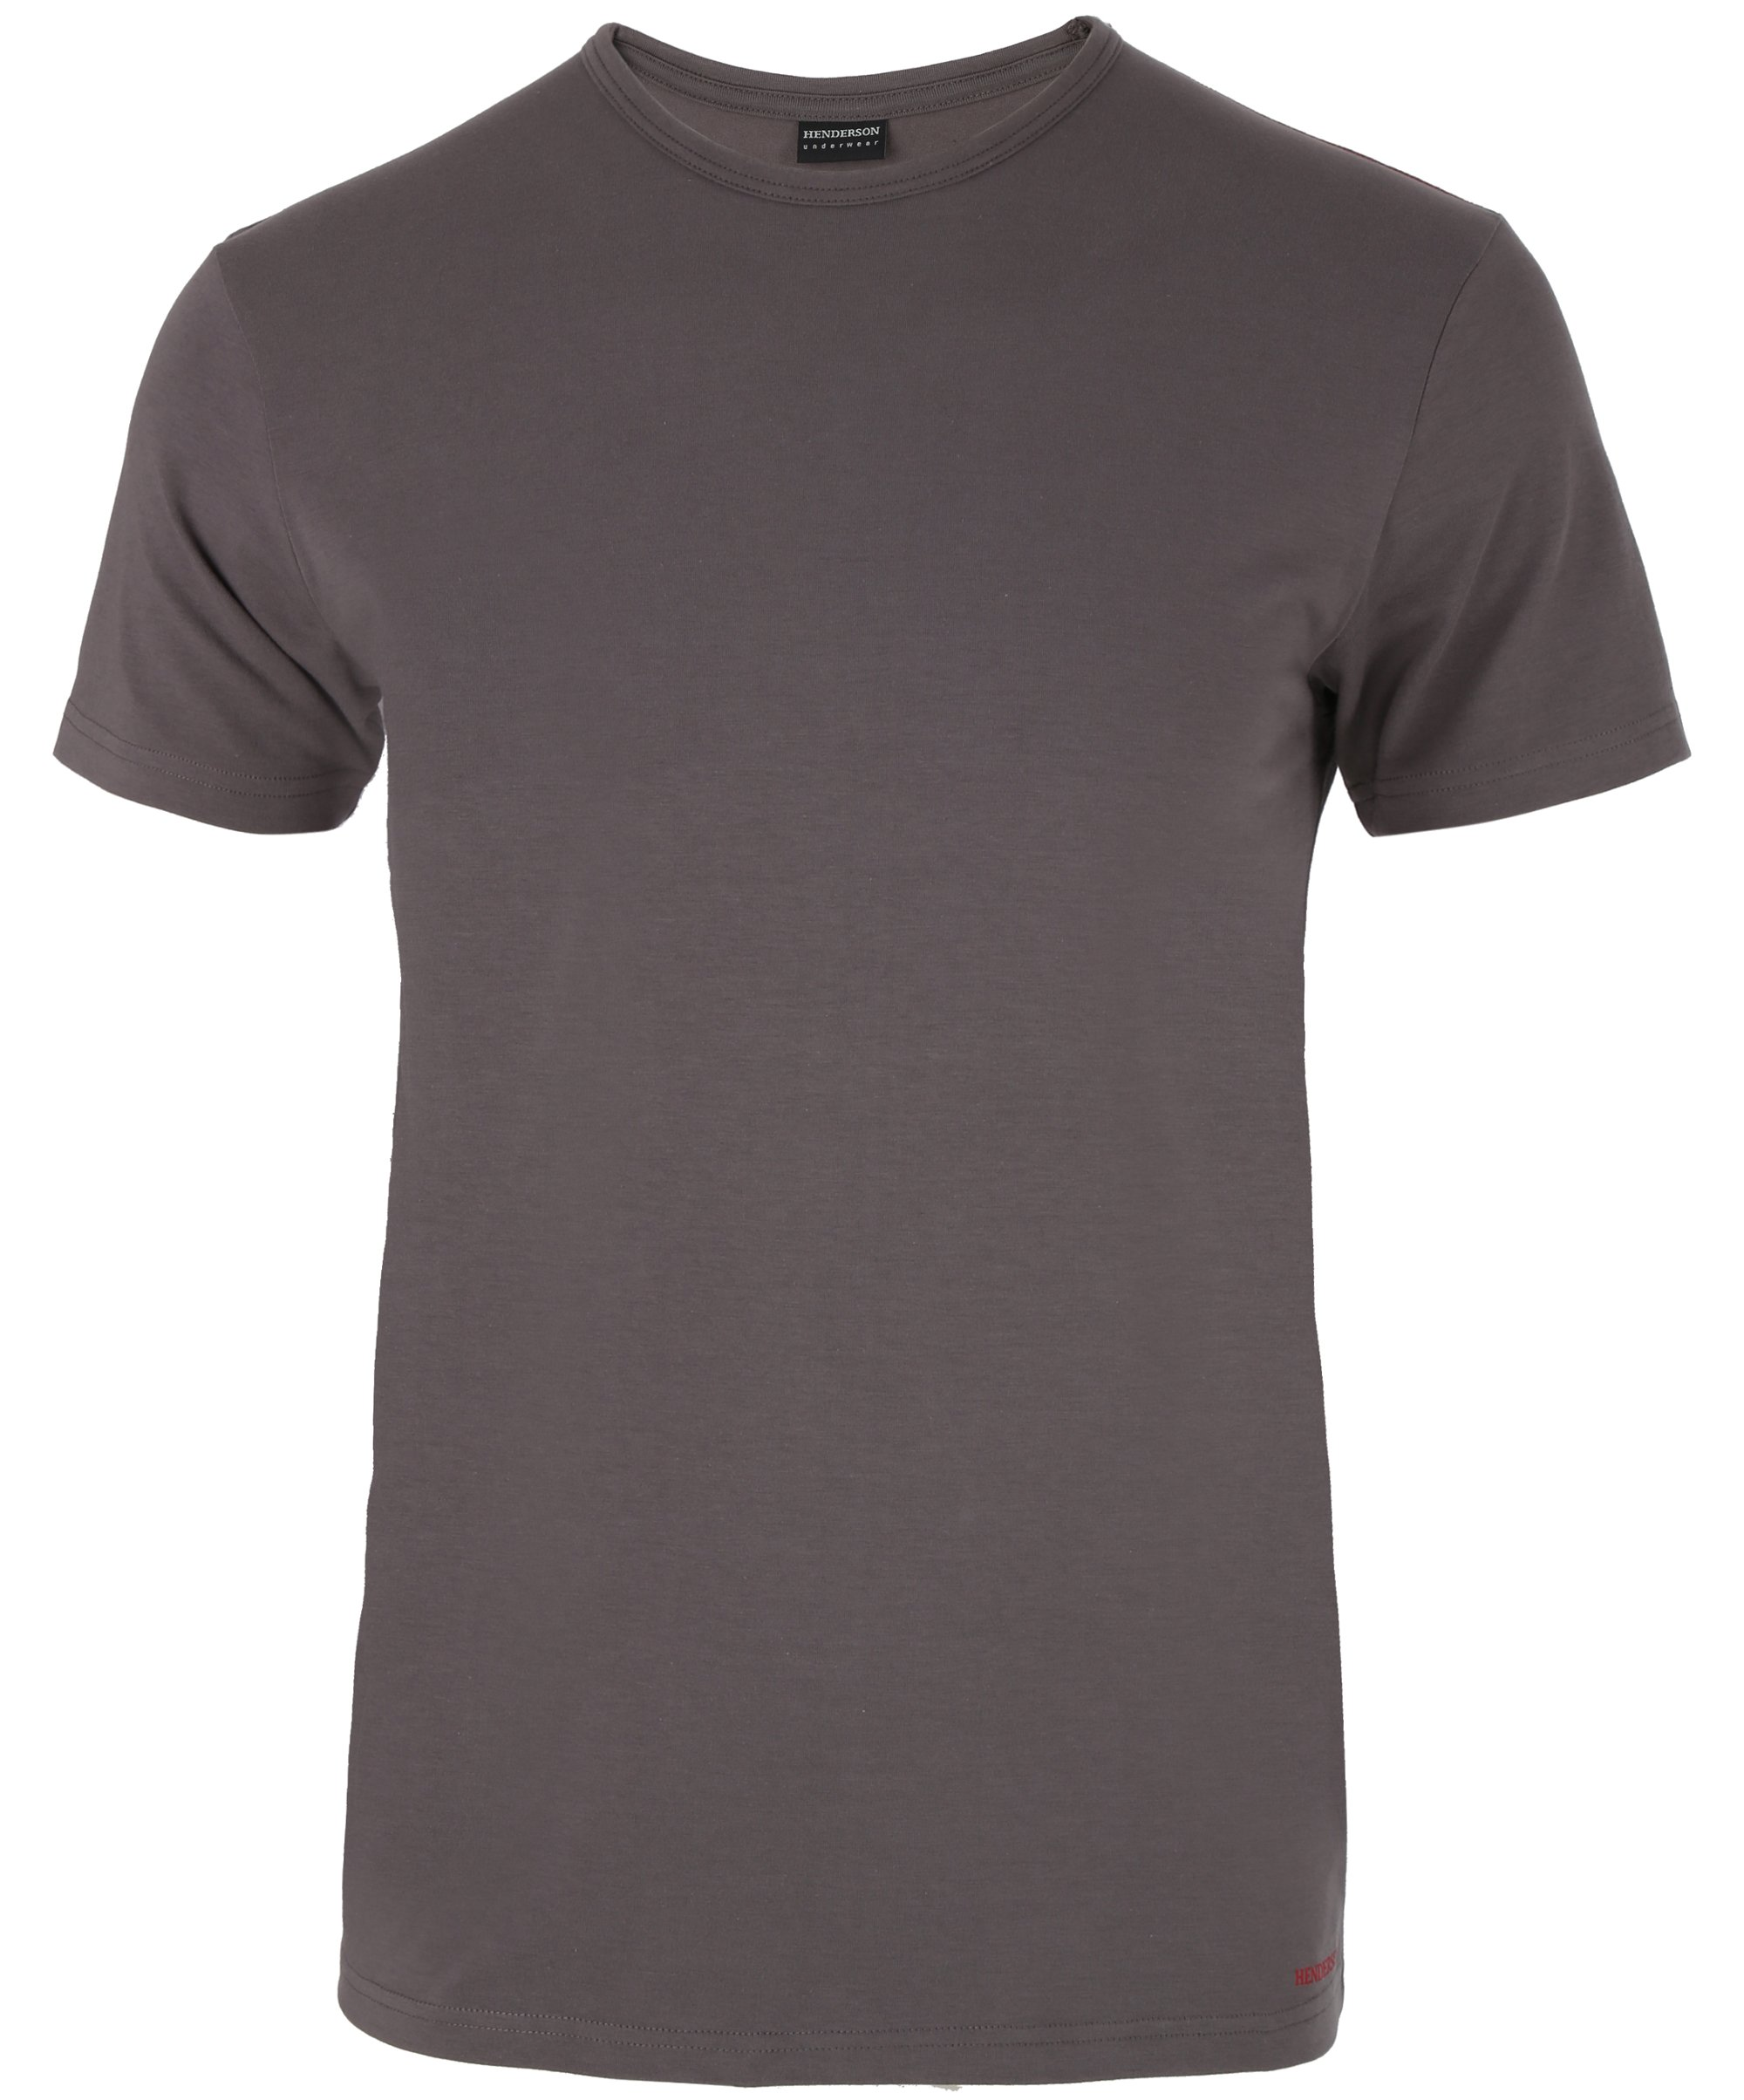 Koszulka MĘSKA HENDERSON RED LINE 18731 - r L Zestaw nie